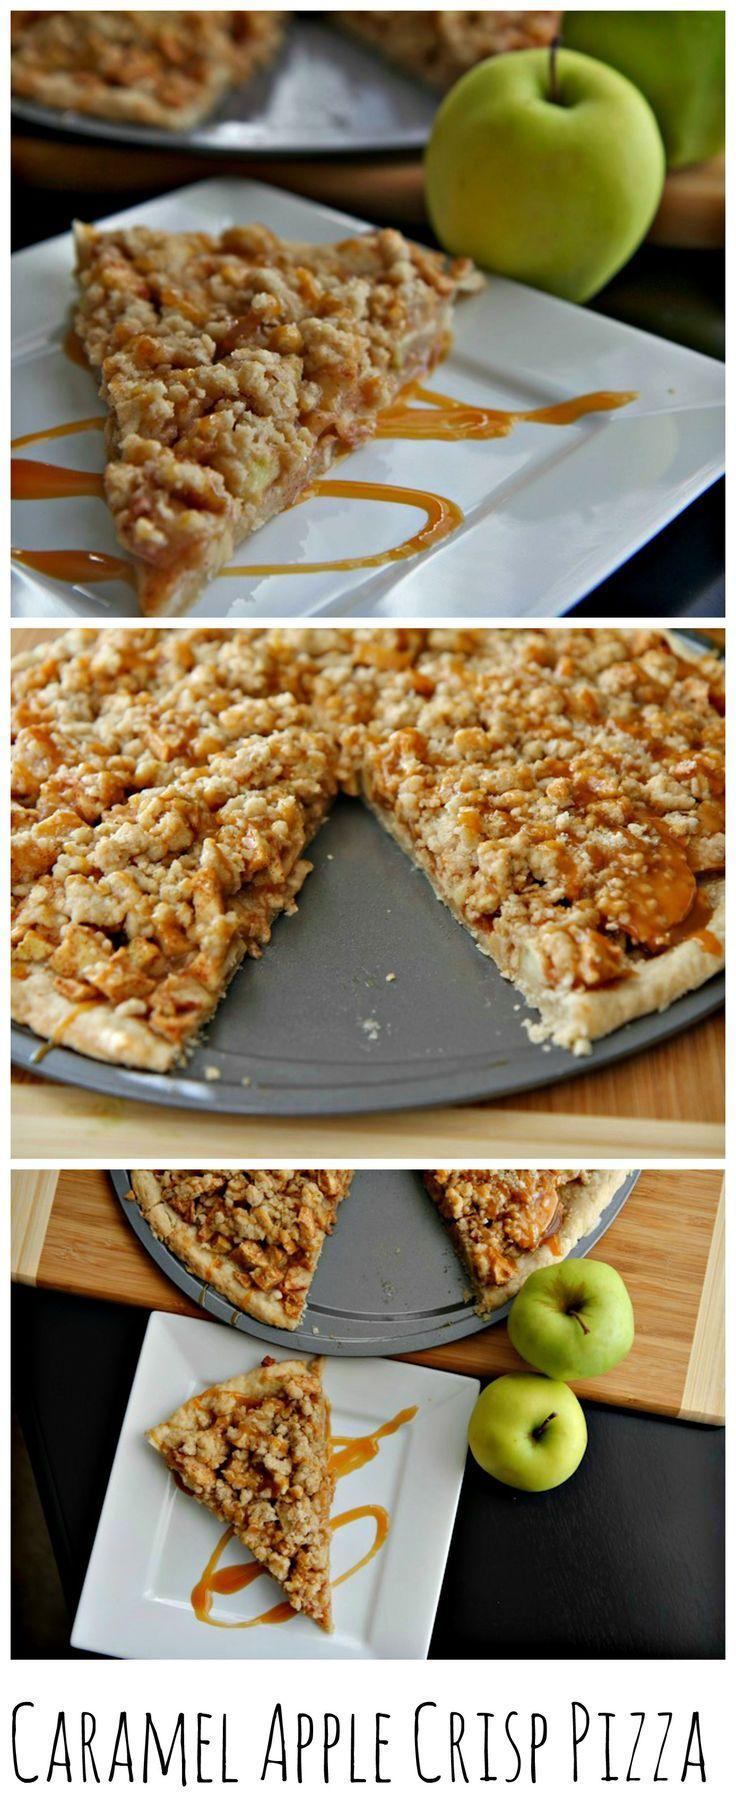 Caramel Apple Crisp Pizza, perfect for this time of the year. #dessertpizza #caramelapplecrisp